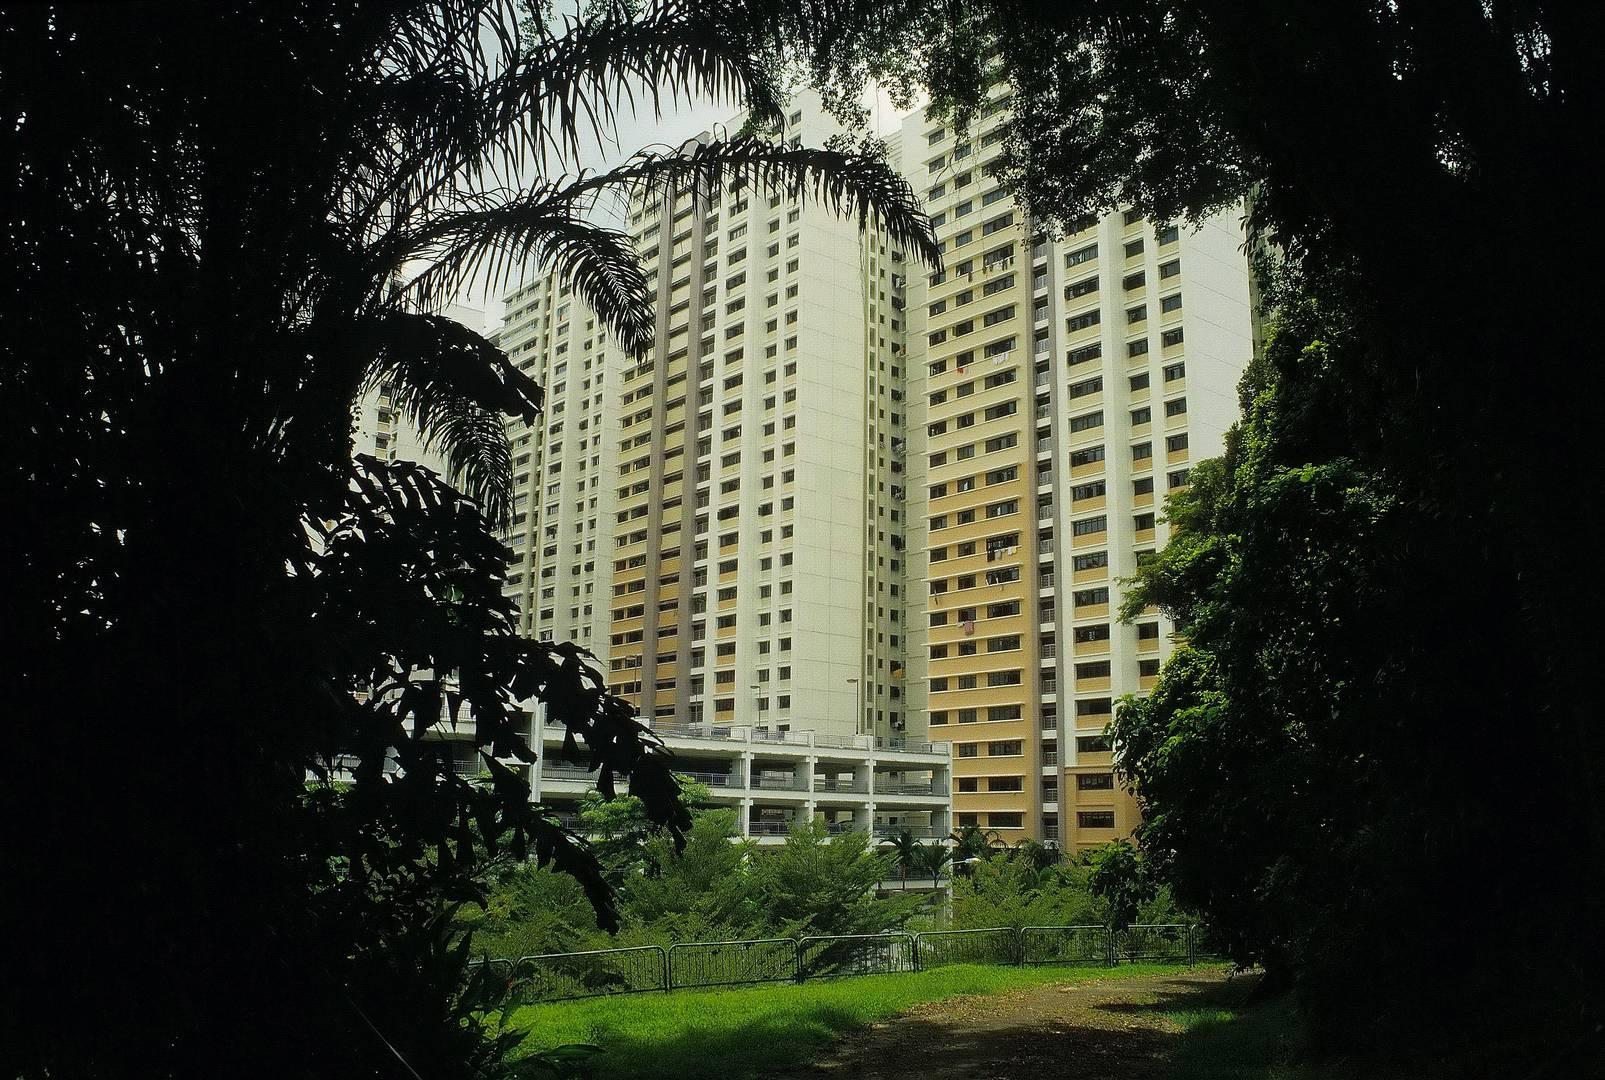 Singapur Wohnsilo